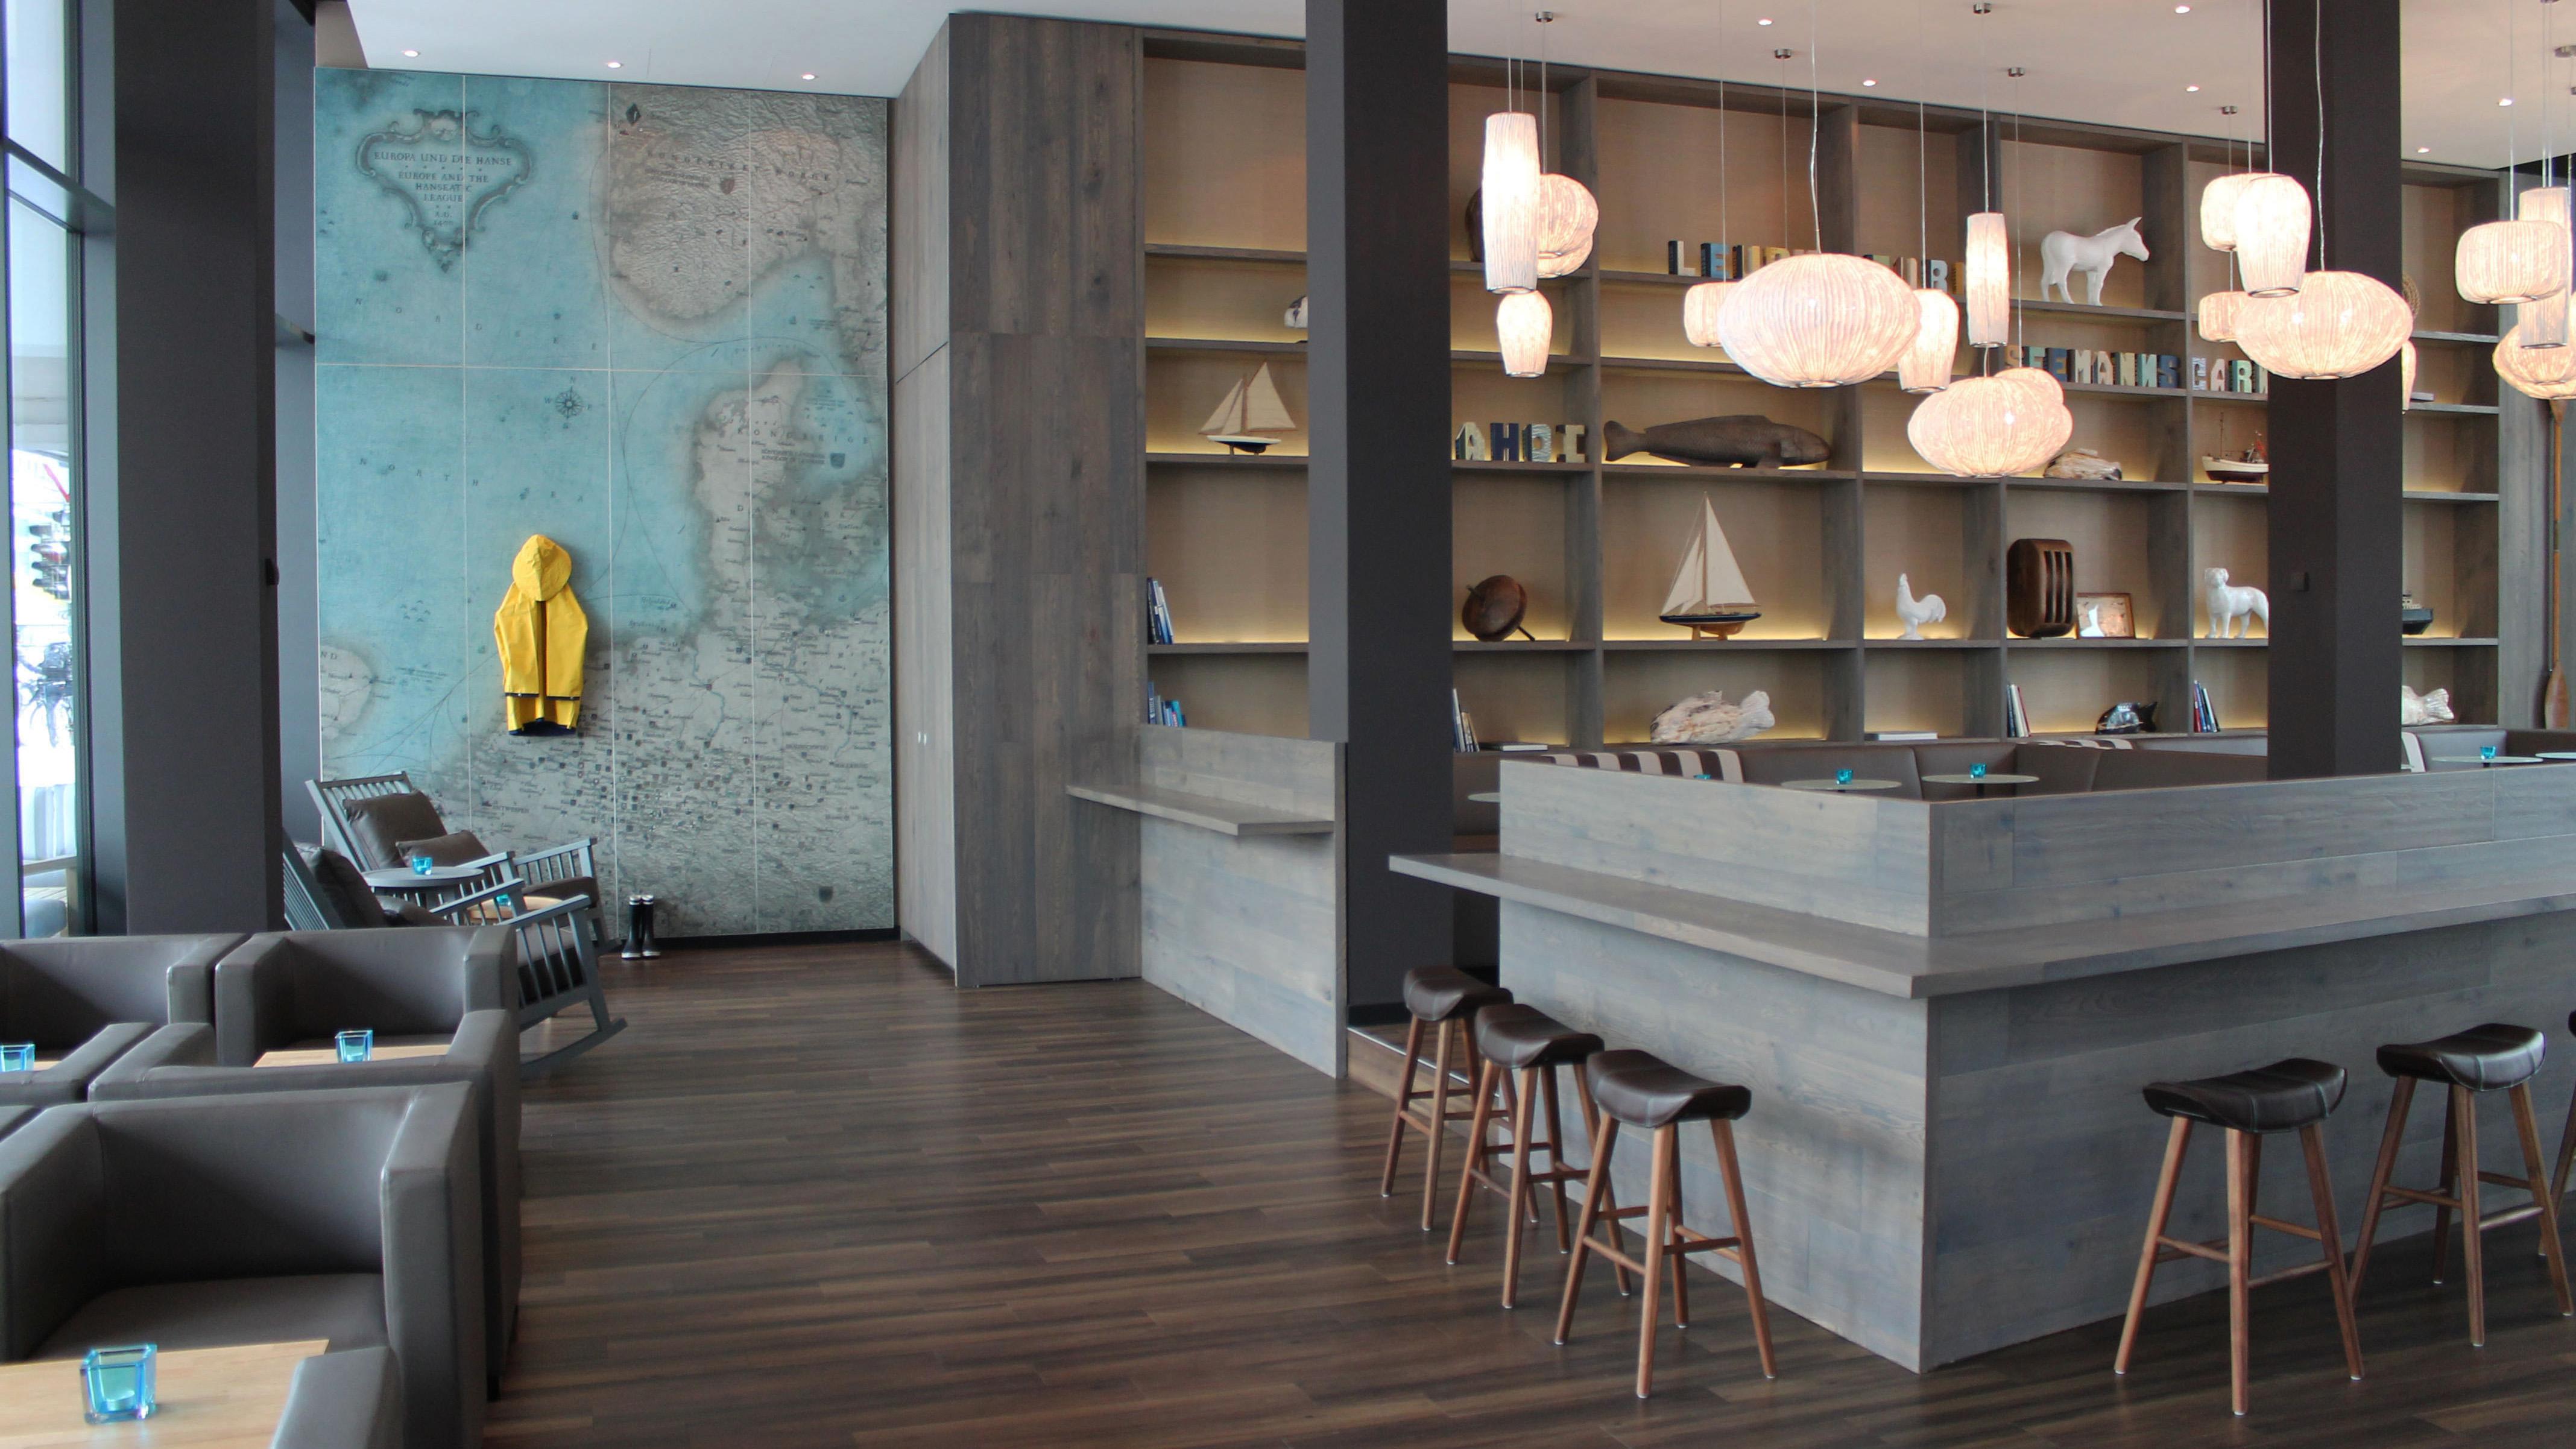 tourismus reise transport in bremen infobel deutschland. Black Bedroom Furniture Sets. Home Design Ideas